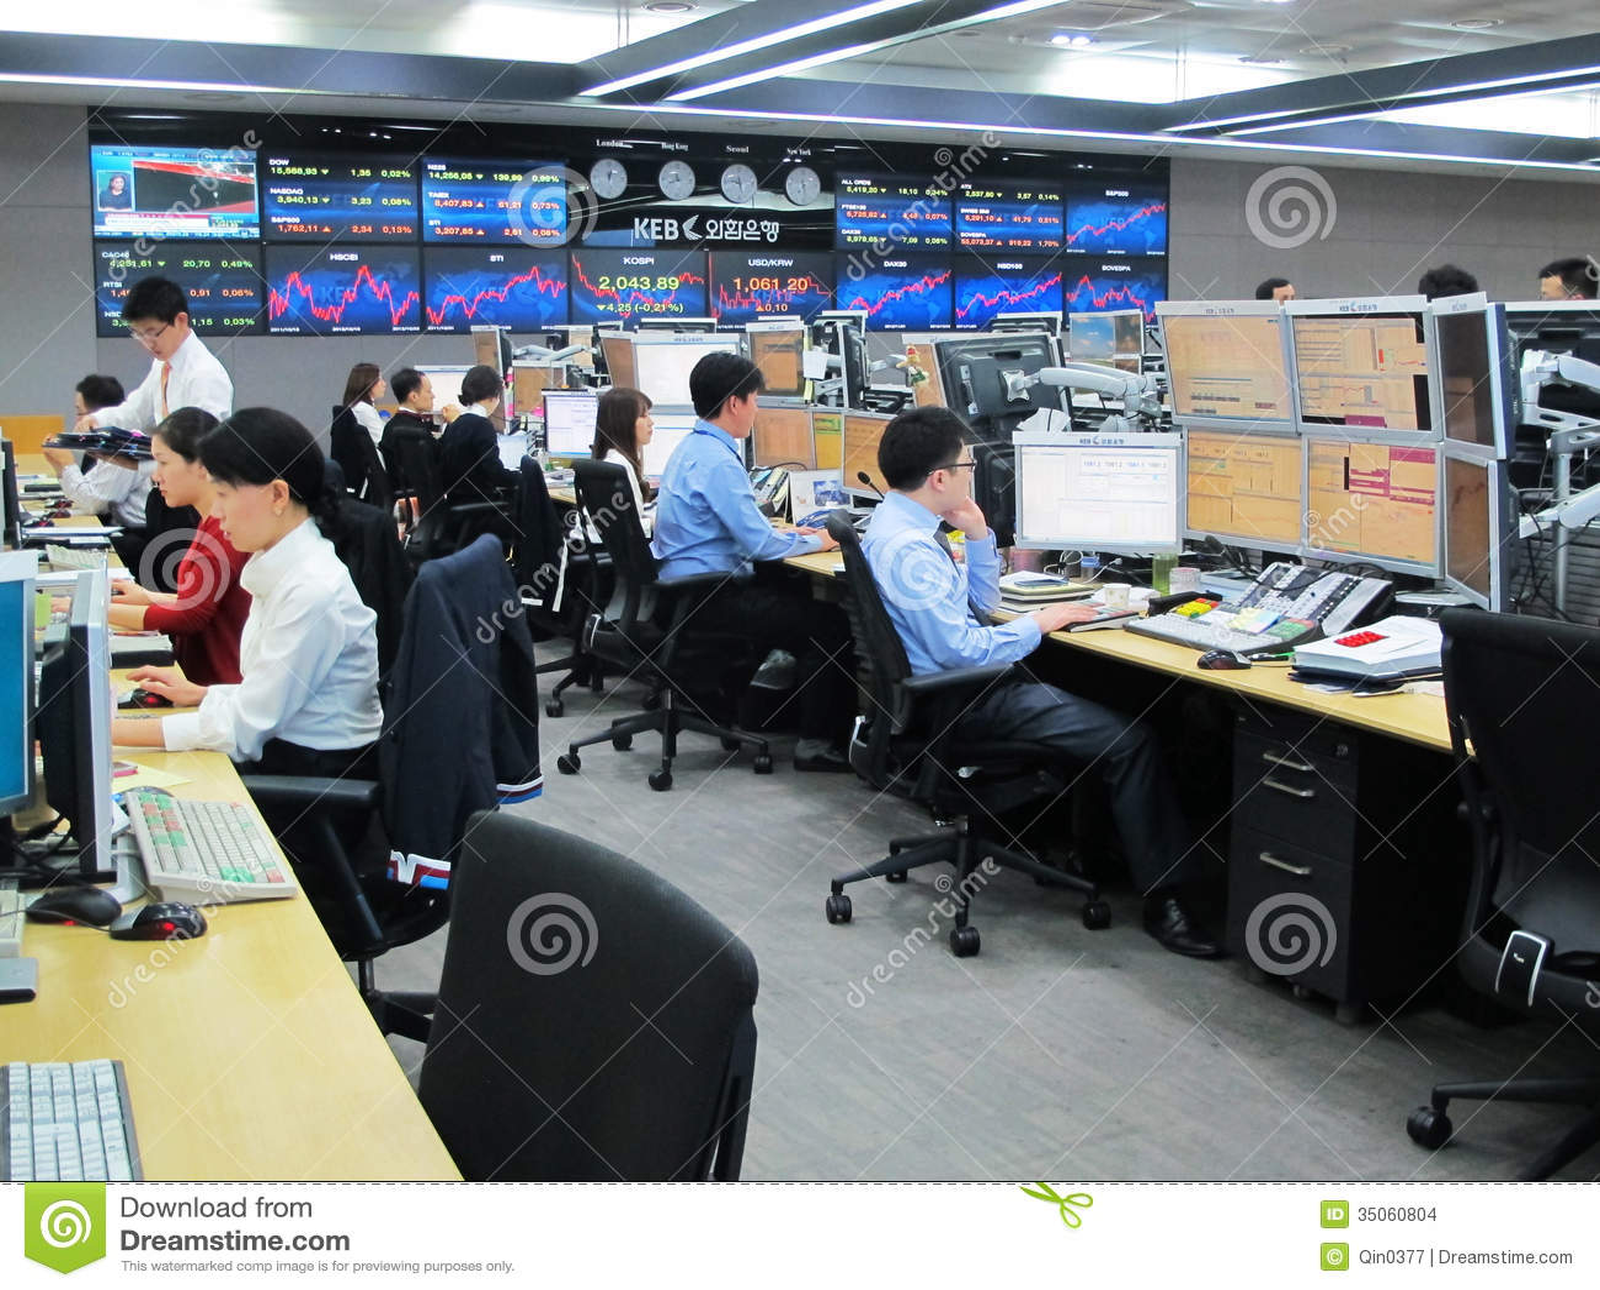 Banking transactions operator